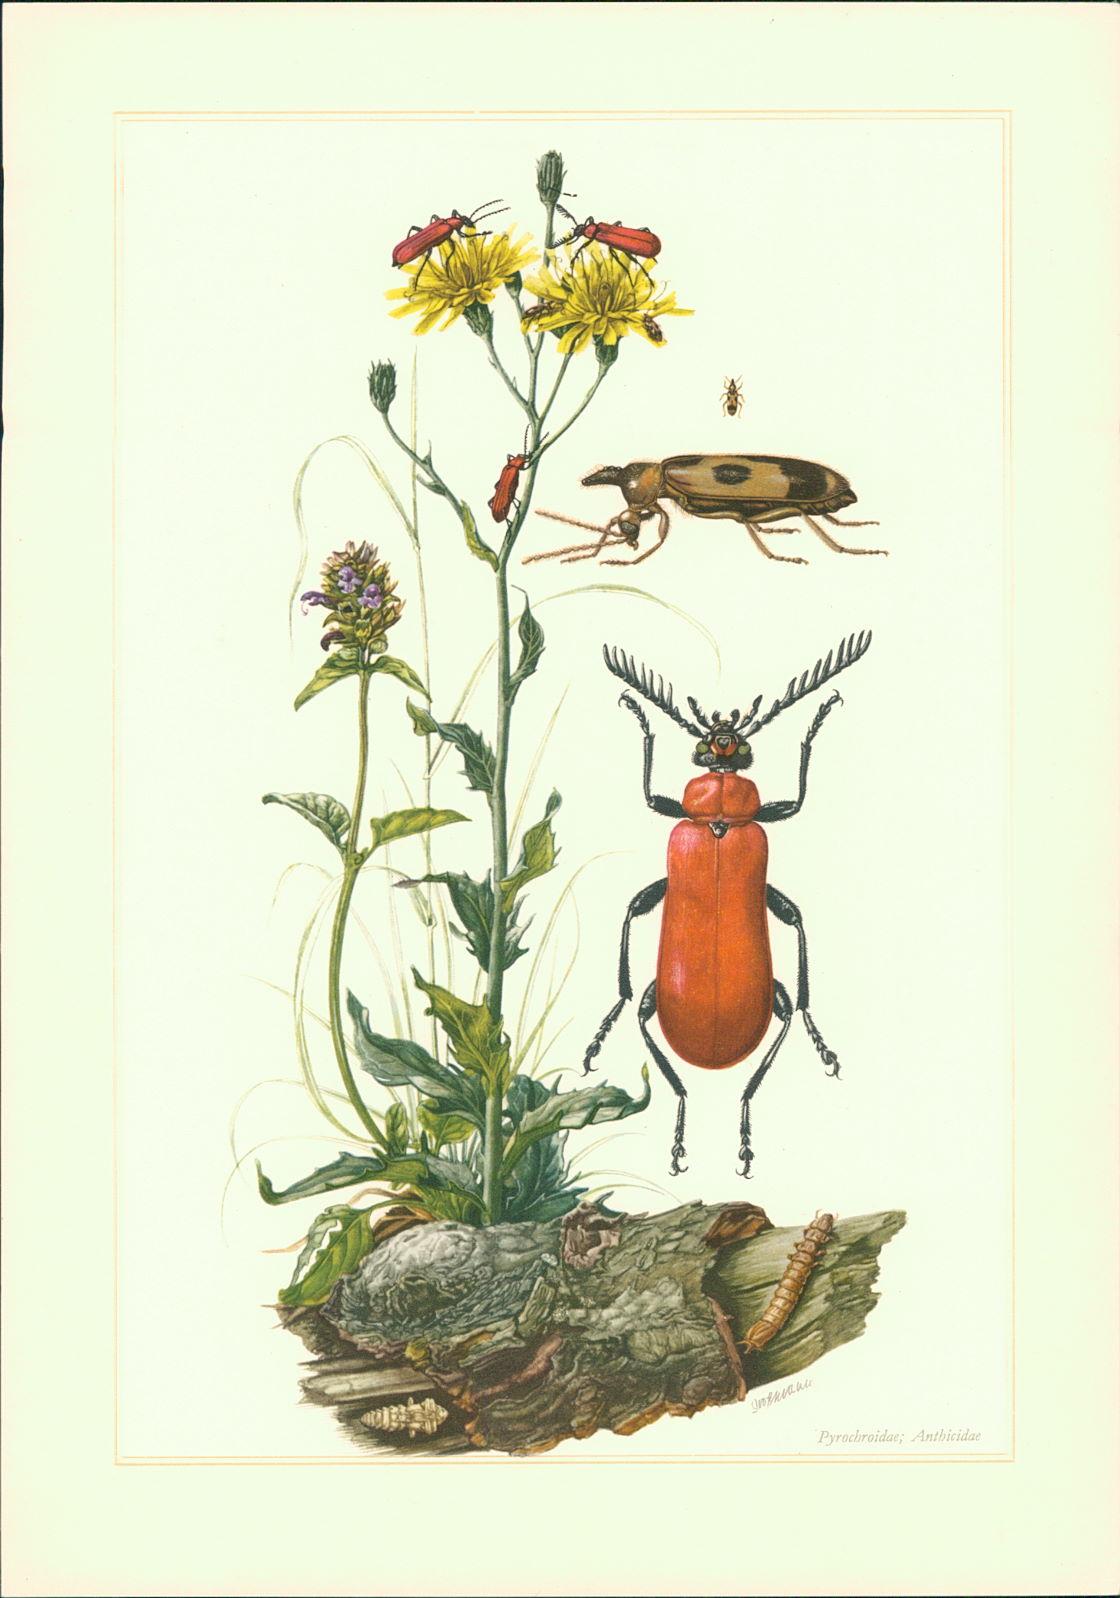 Grossmann, K.: Kunstdruck - Offsetdruck. Käfer. Feuerkäfer. Kardinalkäfer (Pyrochroa coccinea l.). Einhornkäfer Notoxus (= Anthicus) monoceros l.) Farboffsetdruck.